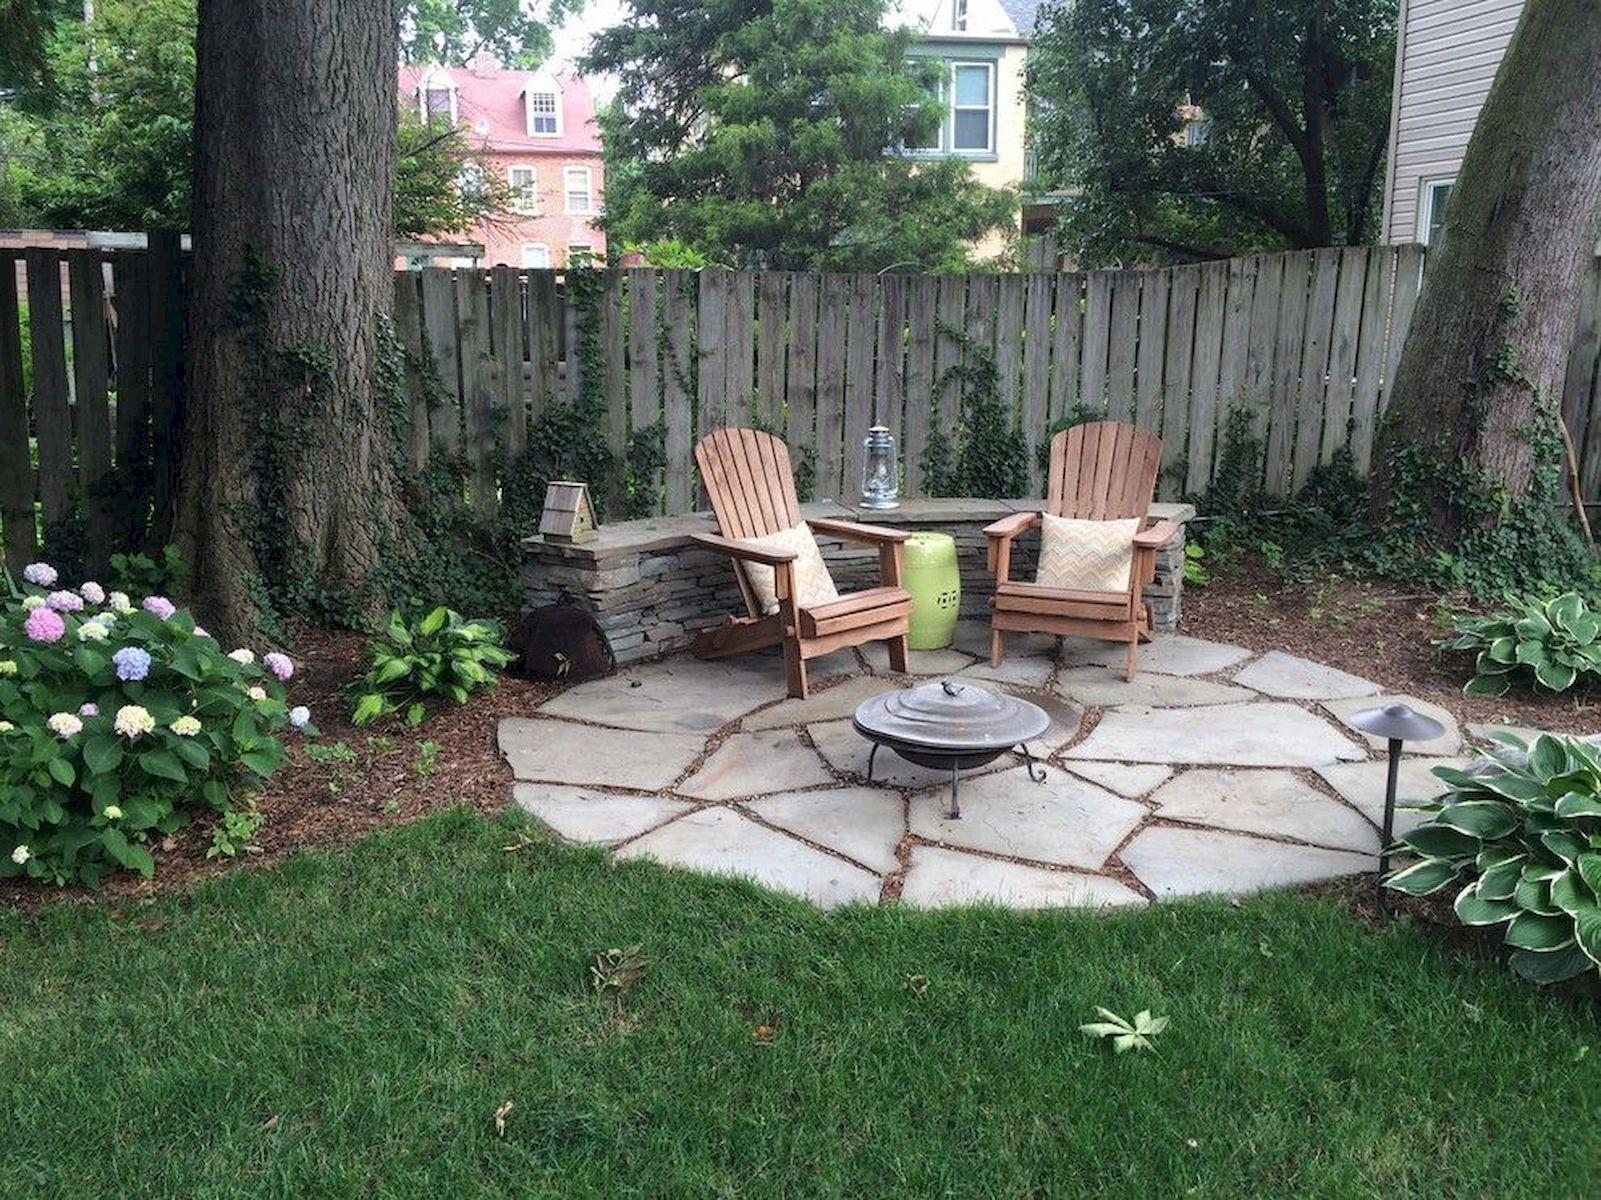 52 Most Creative Cheap Backyard Patio Ideas On A Budget Small